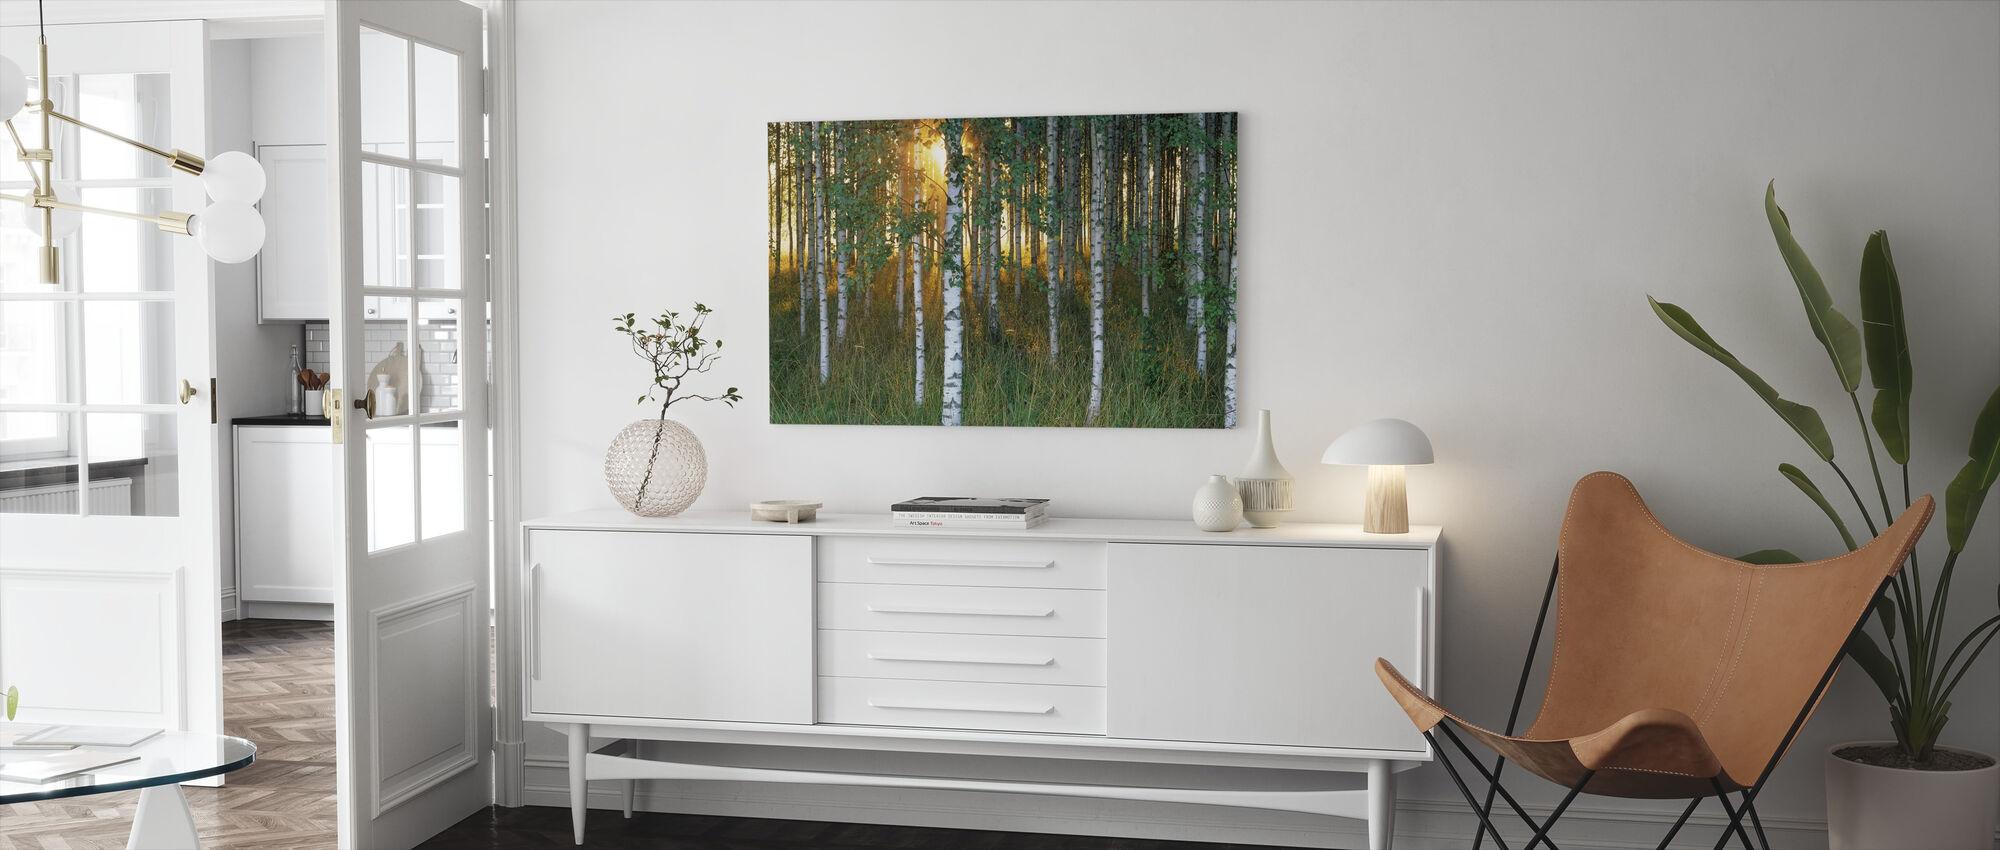 Sunbeam through Birch Forest - Canvas print - Living Room